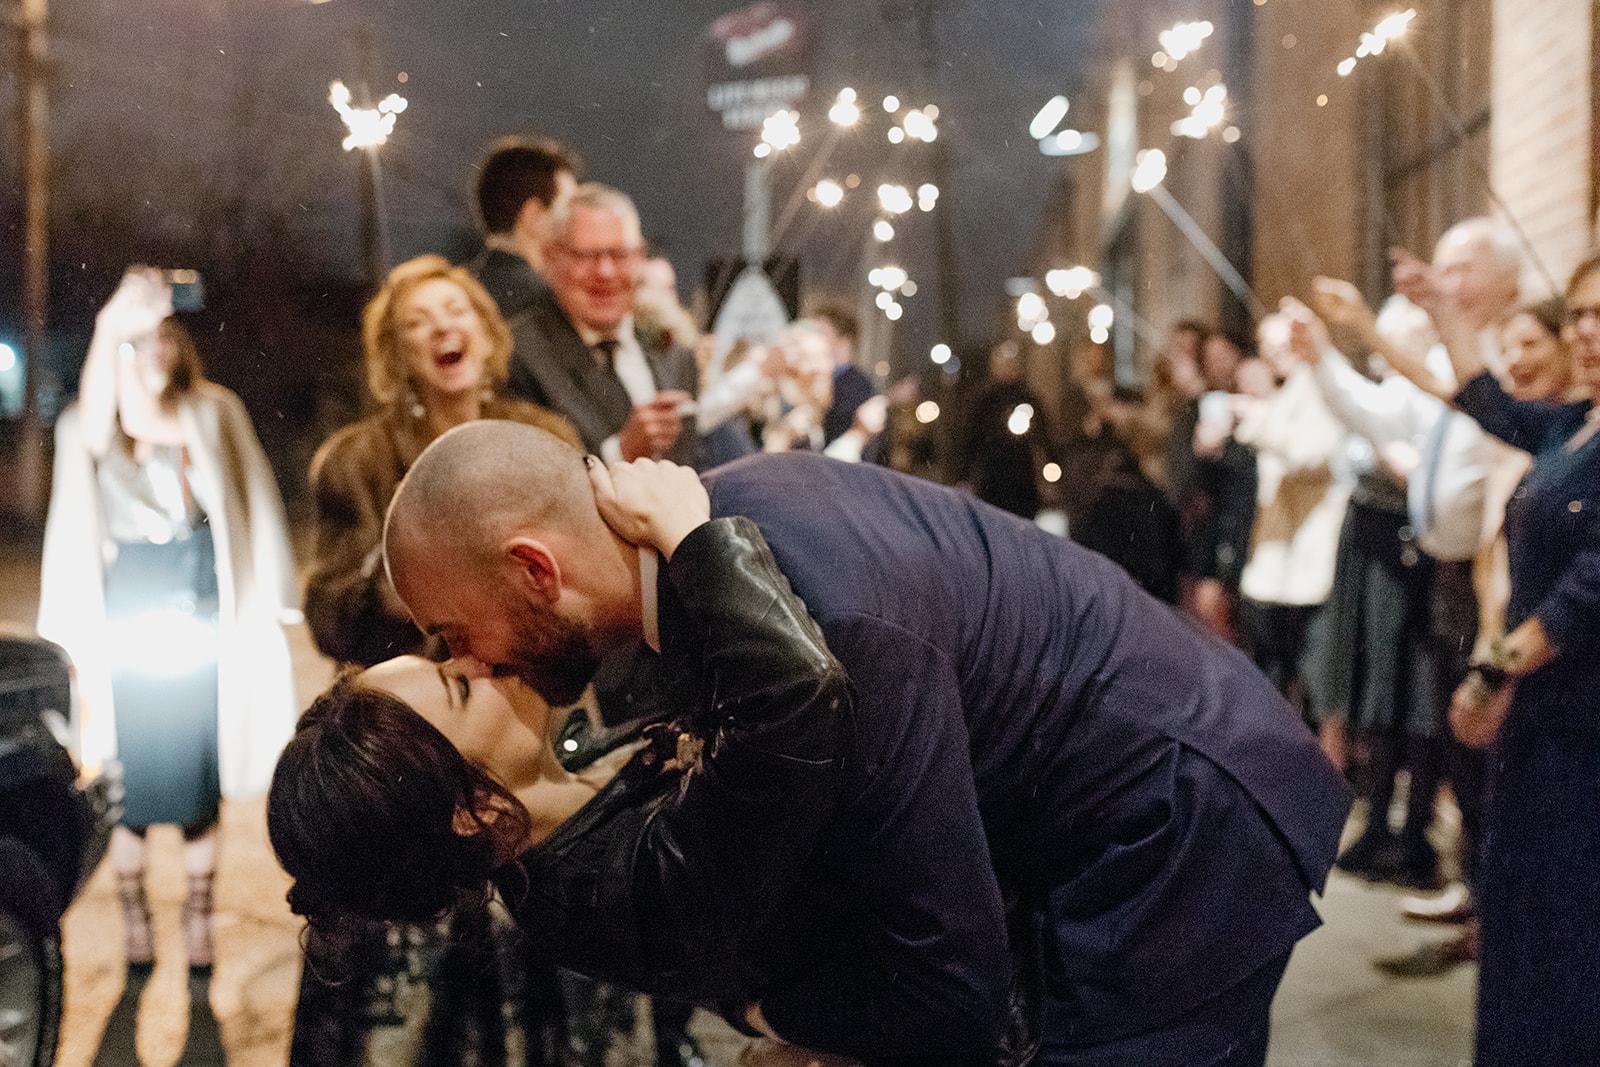 Sparkler exit in the snow!! Magical Nashville Wedding!